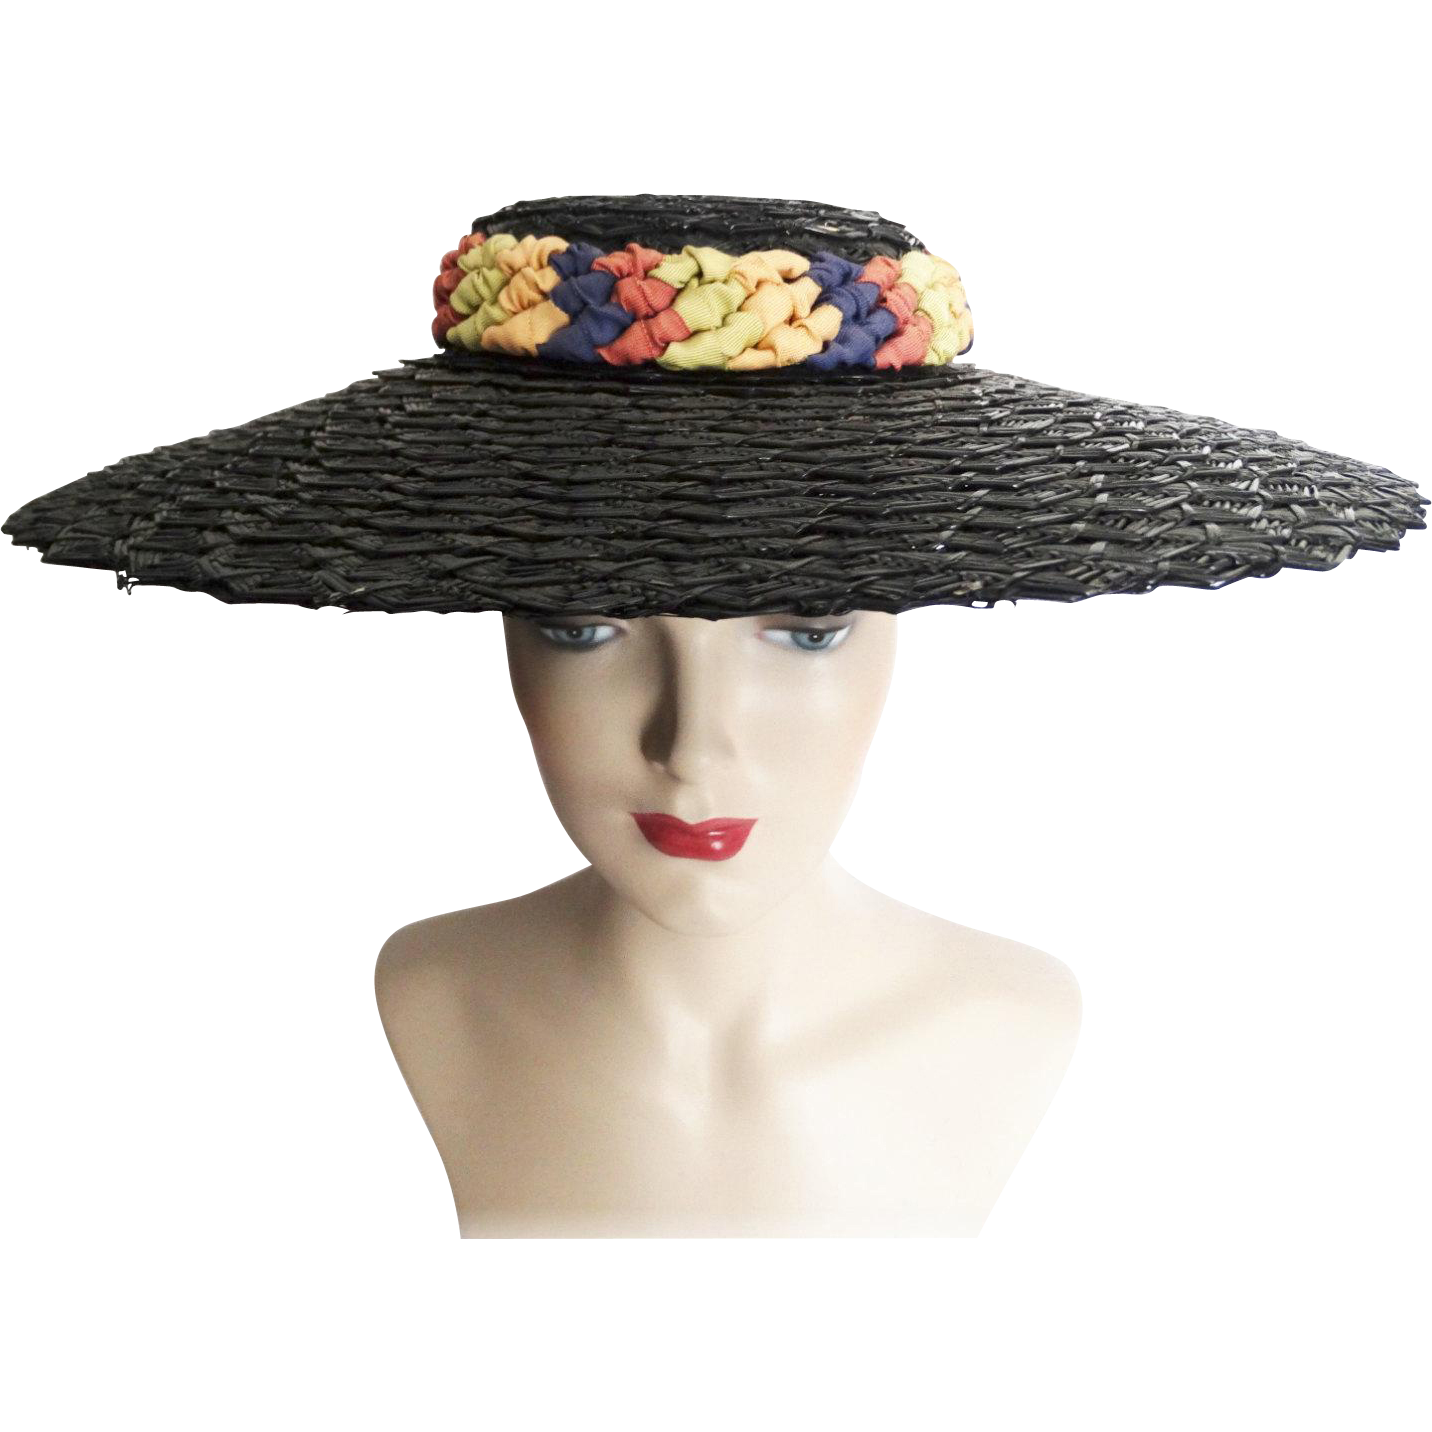 469c9ab36b8 Vintage 1940s Hat//Large Brim//Braided Headband//Multi Colored Ribbons//40  Hat//